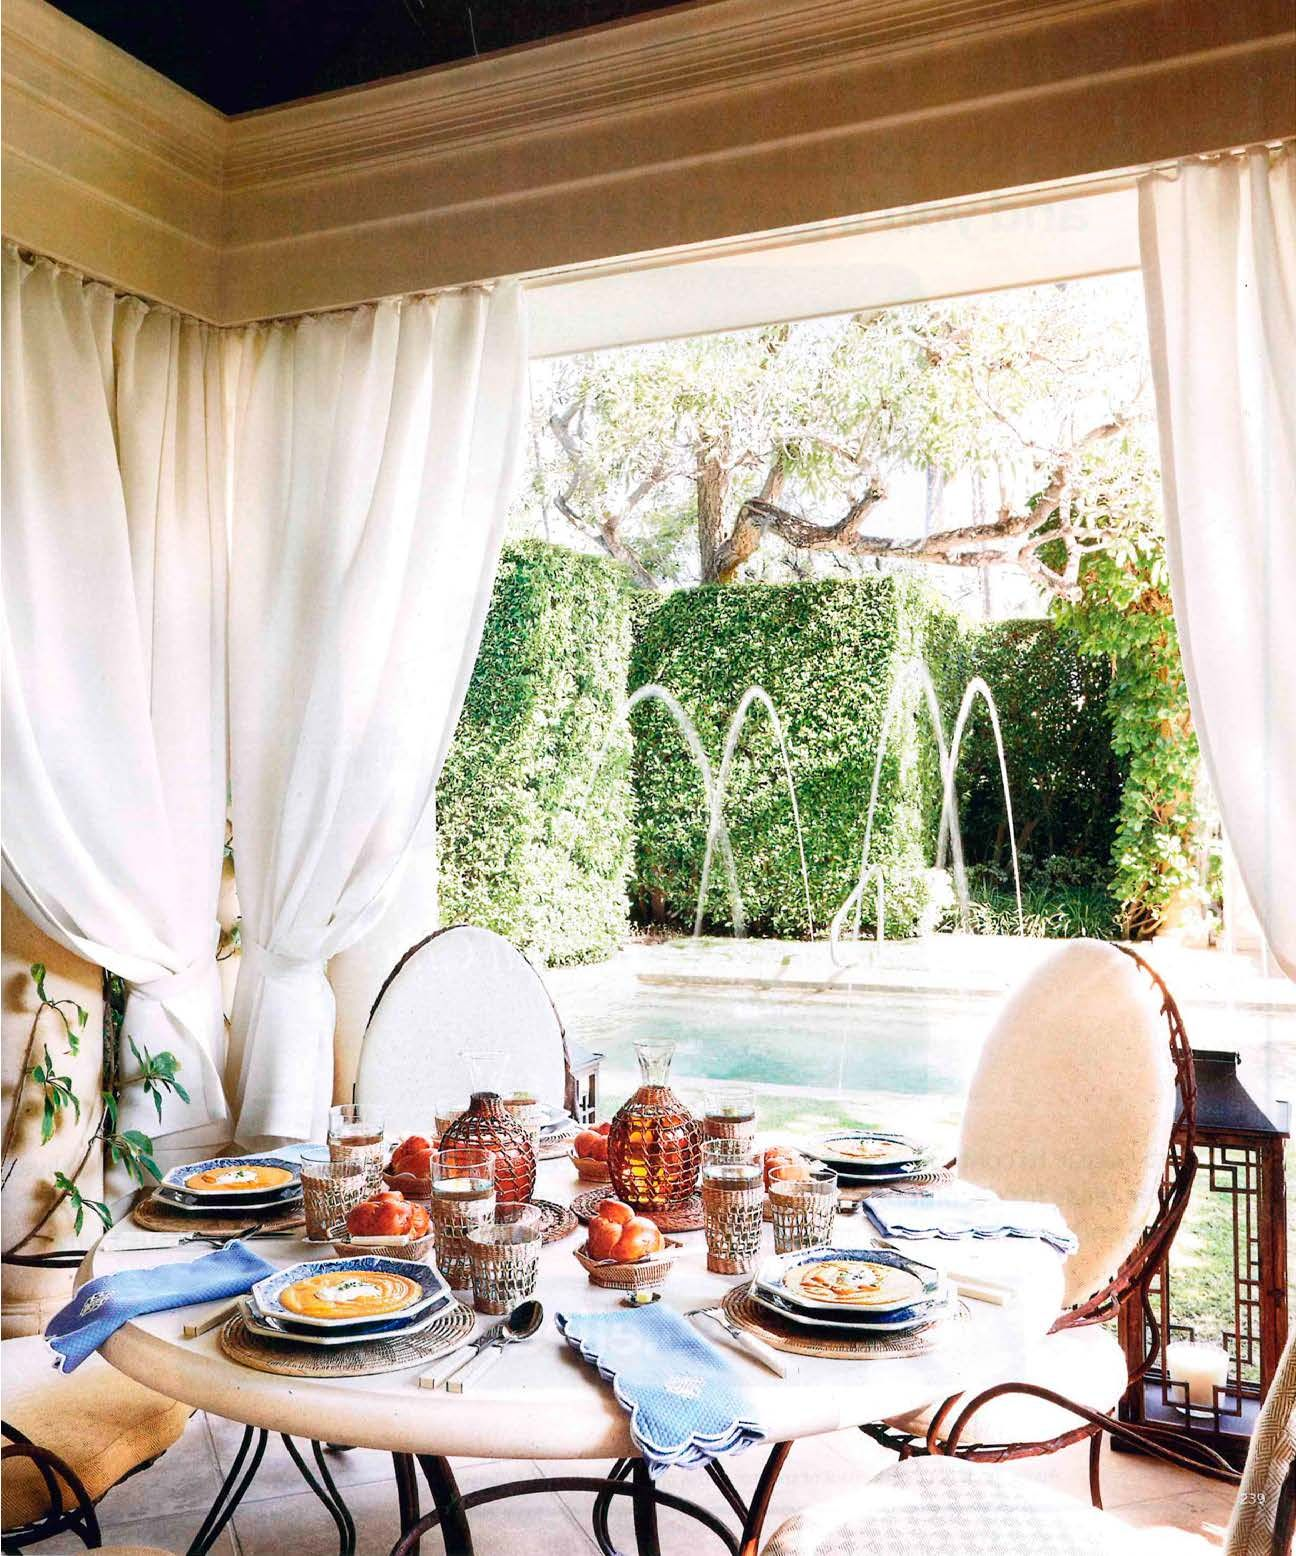 open air dining | Patio design, Outdoor living, Outdoor rooms on Living Spaces Outdoor Dining id=82867